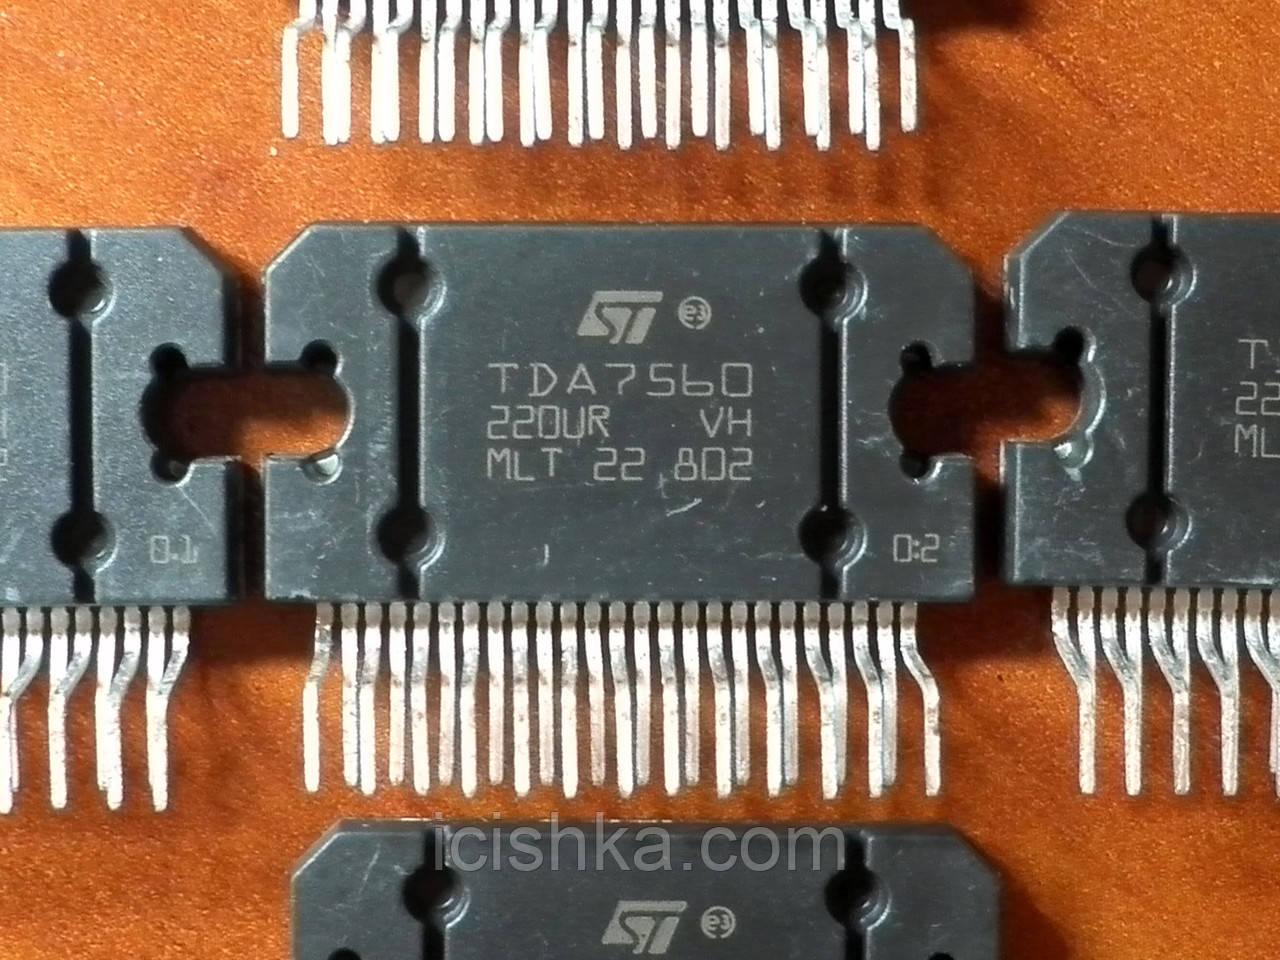 TDA7560 Flexiwatt25 - 4x51W усилитель (УНЧ) для автомагнитол